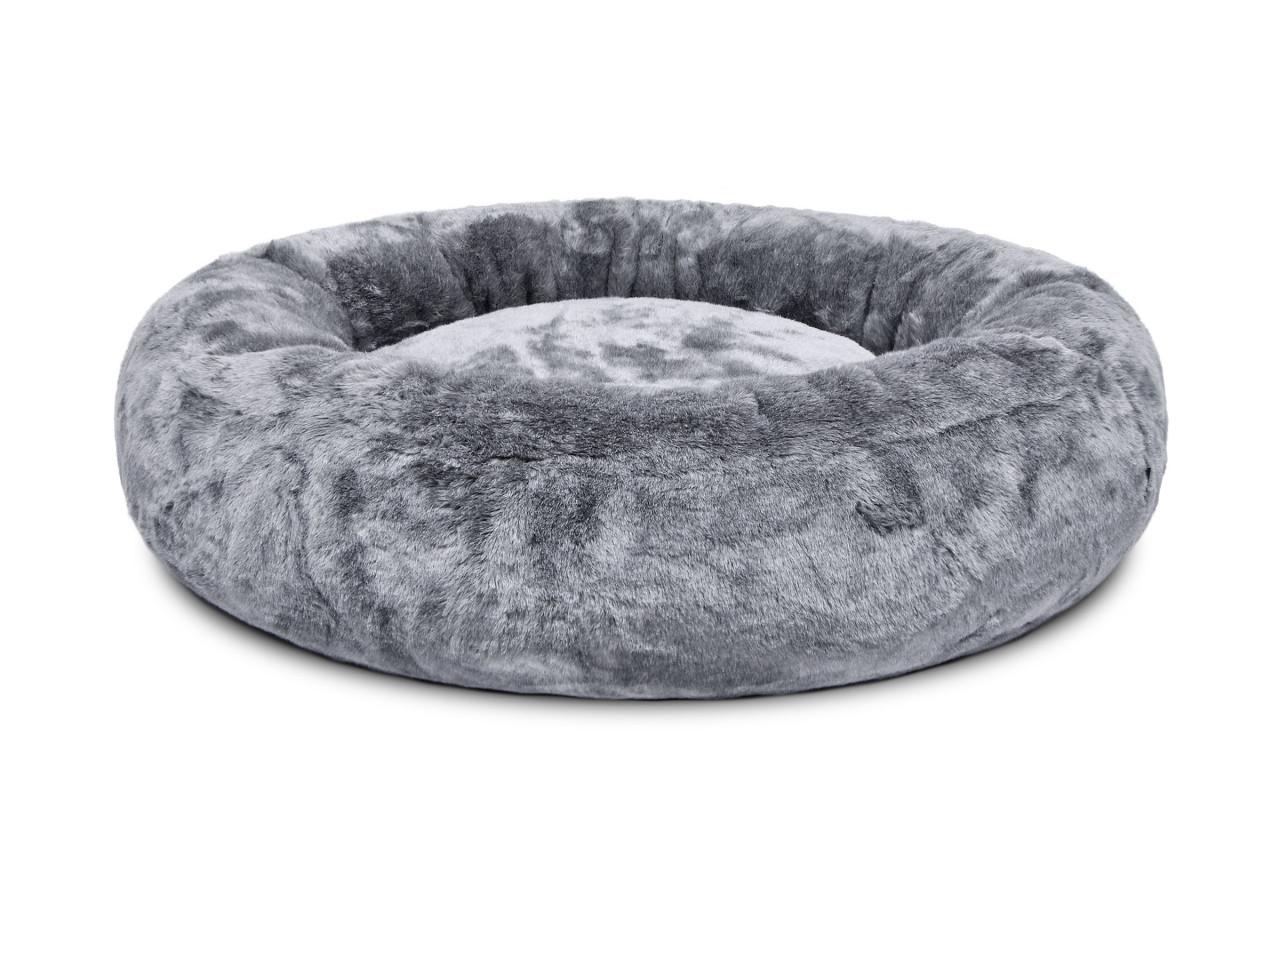 hundebett-COSY BASIC-grey-1